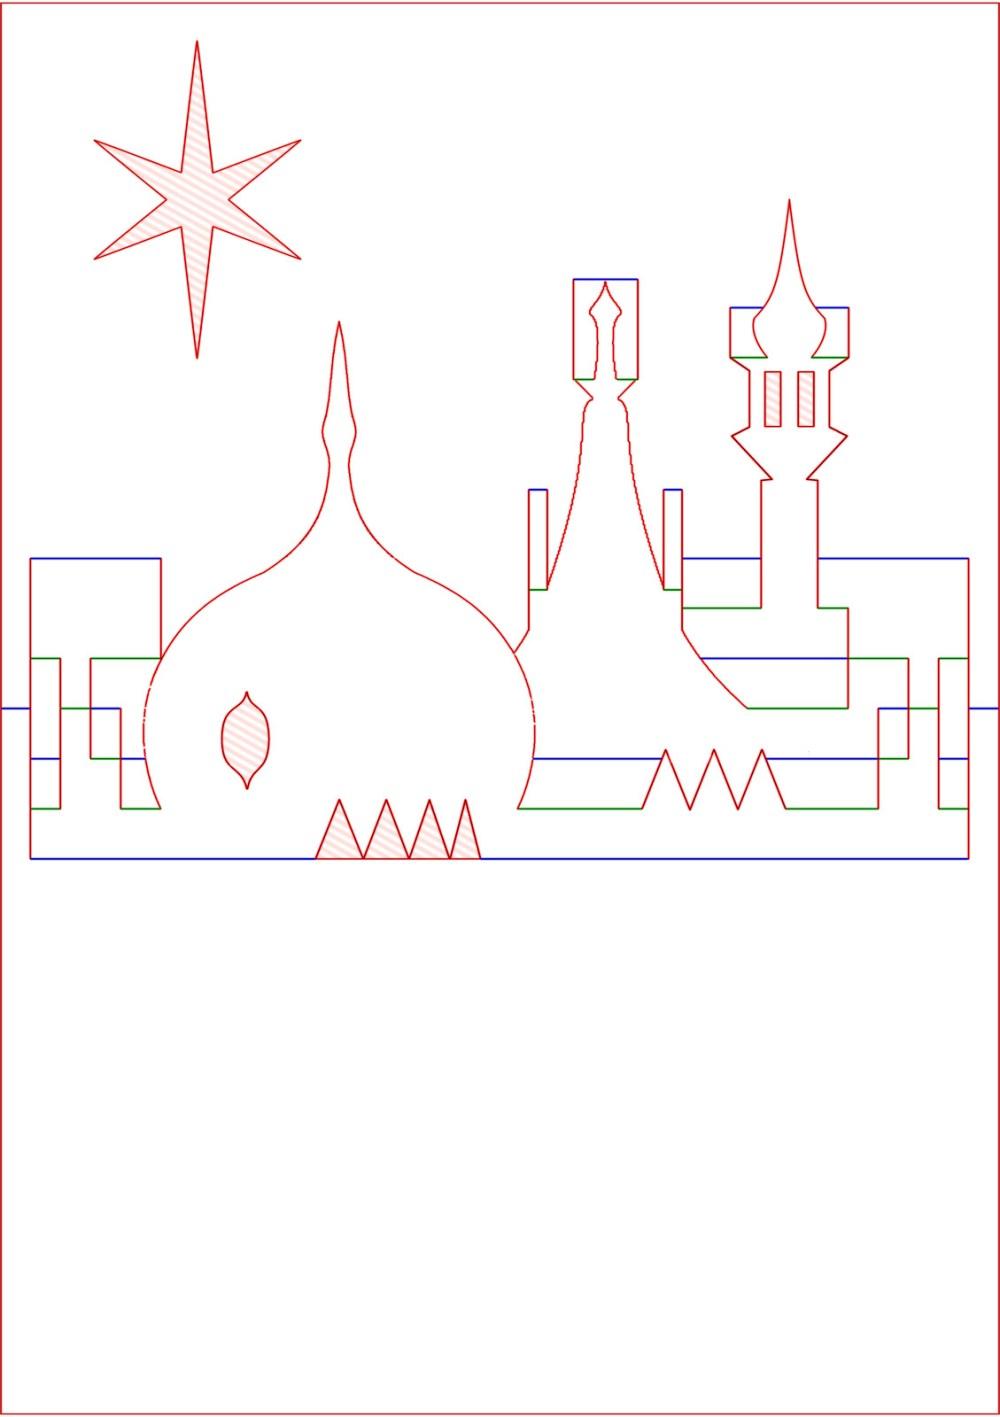 medium resolution of kirigami diagram pop up card prince regent royal brighton pavilion rooftop skyline